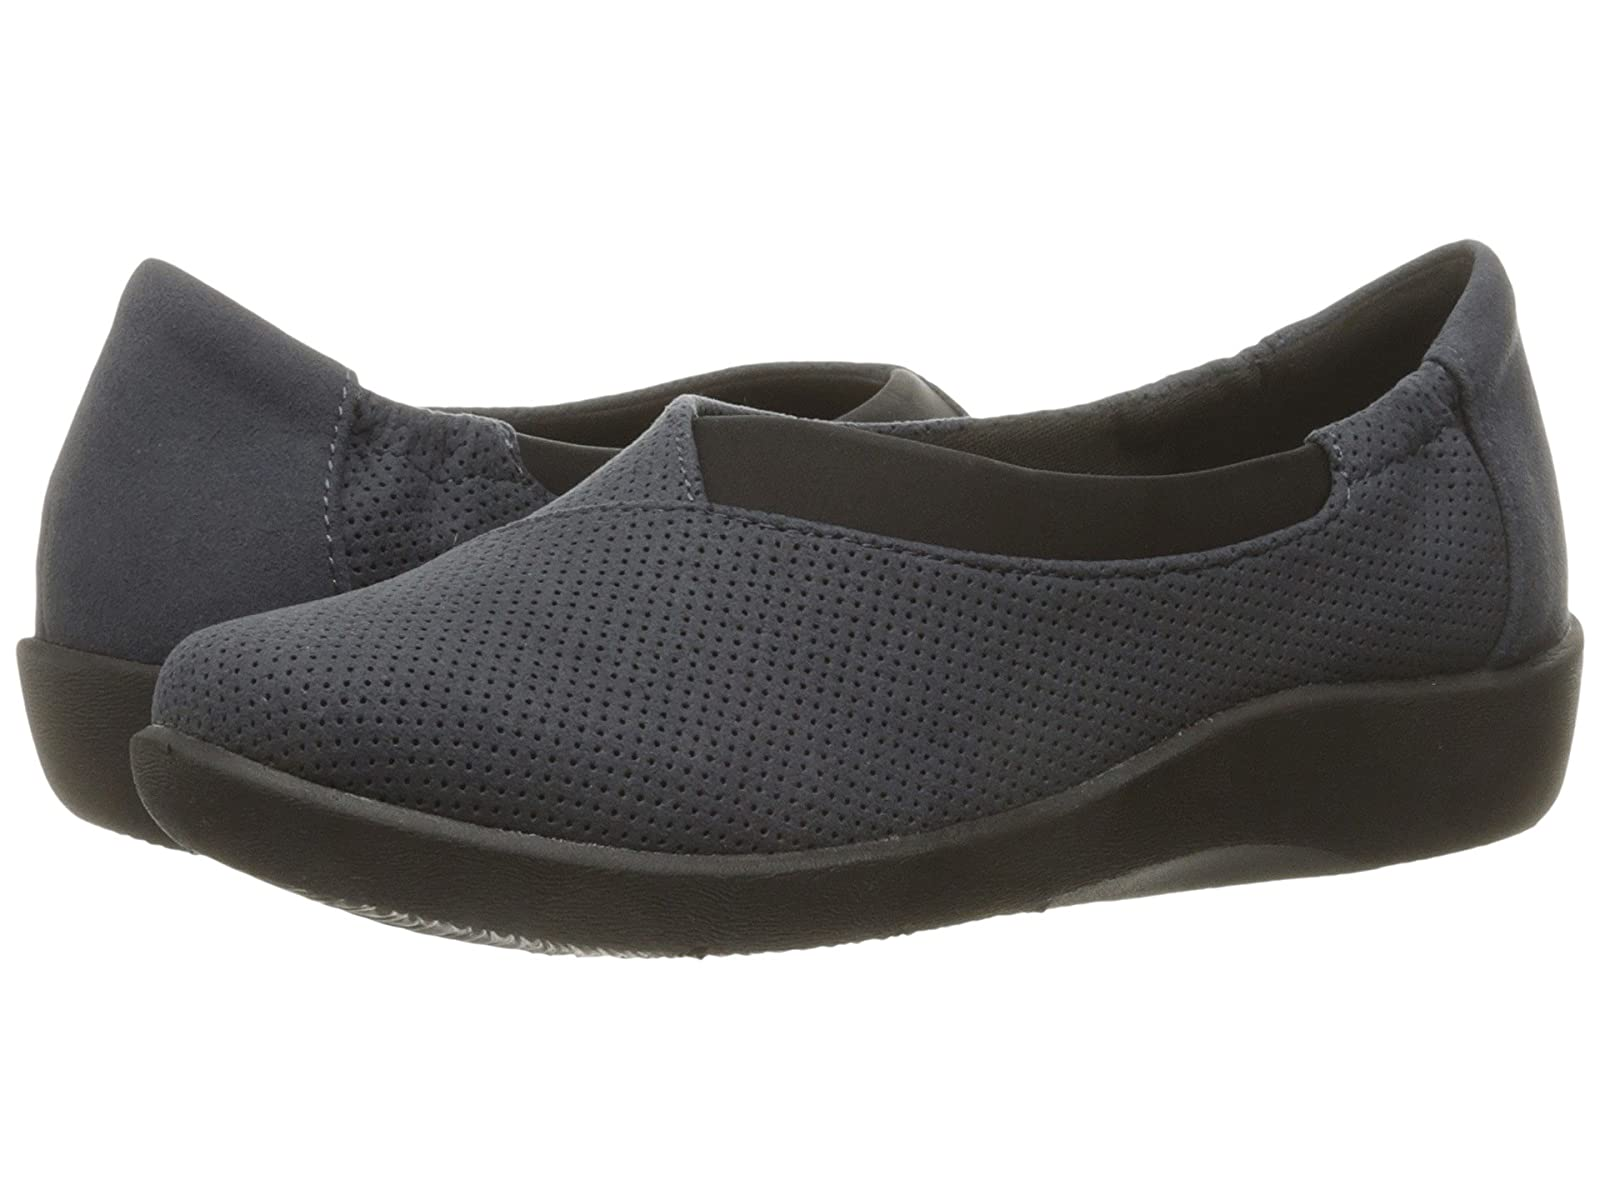 Clarks Sillian JetayCheap and distinctive eye-catching shoes